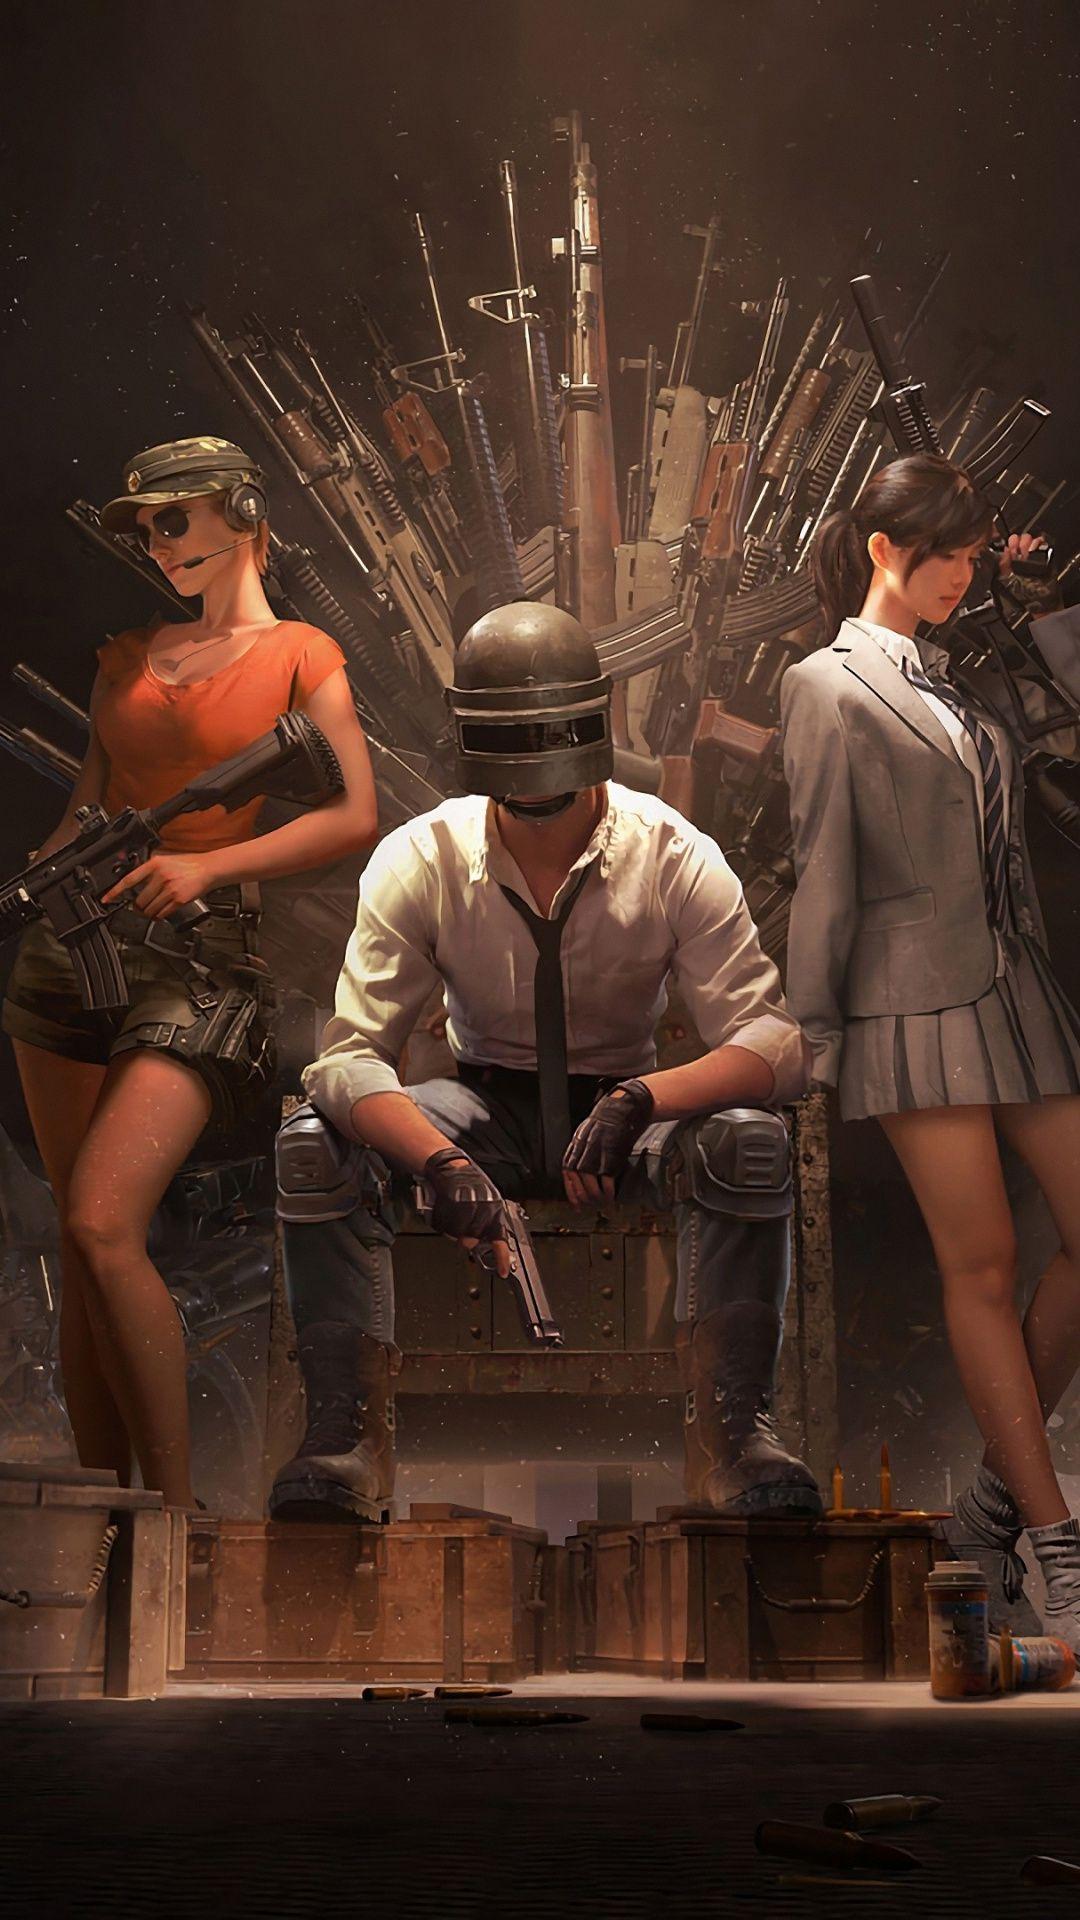 PUBG Helmet guy with girls guns throne video game 1080x1920 1080x1920